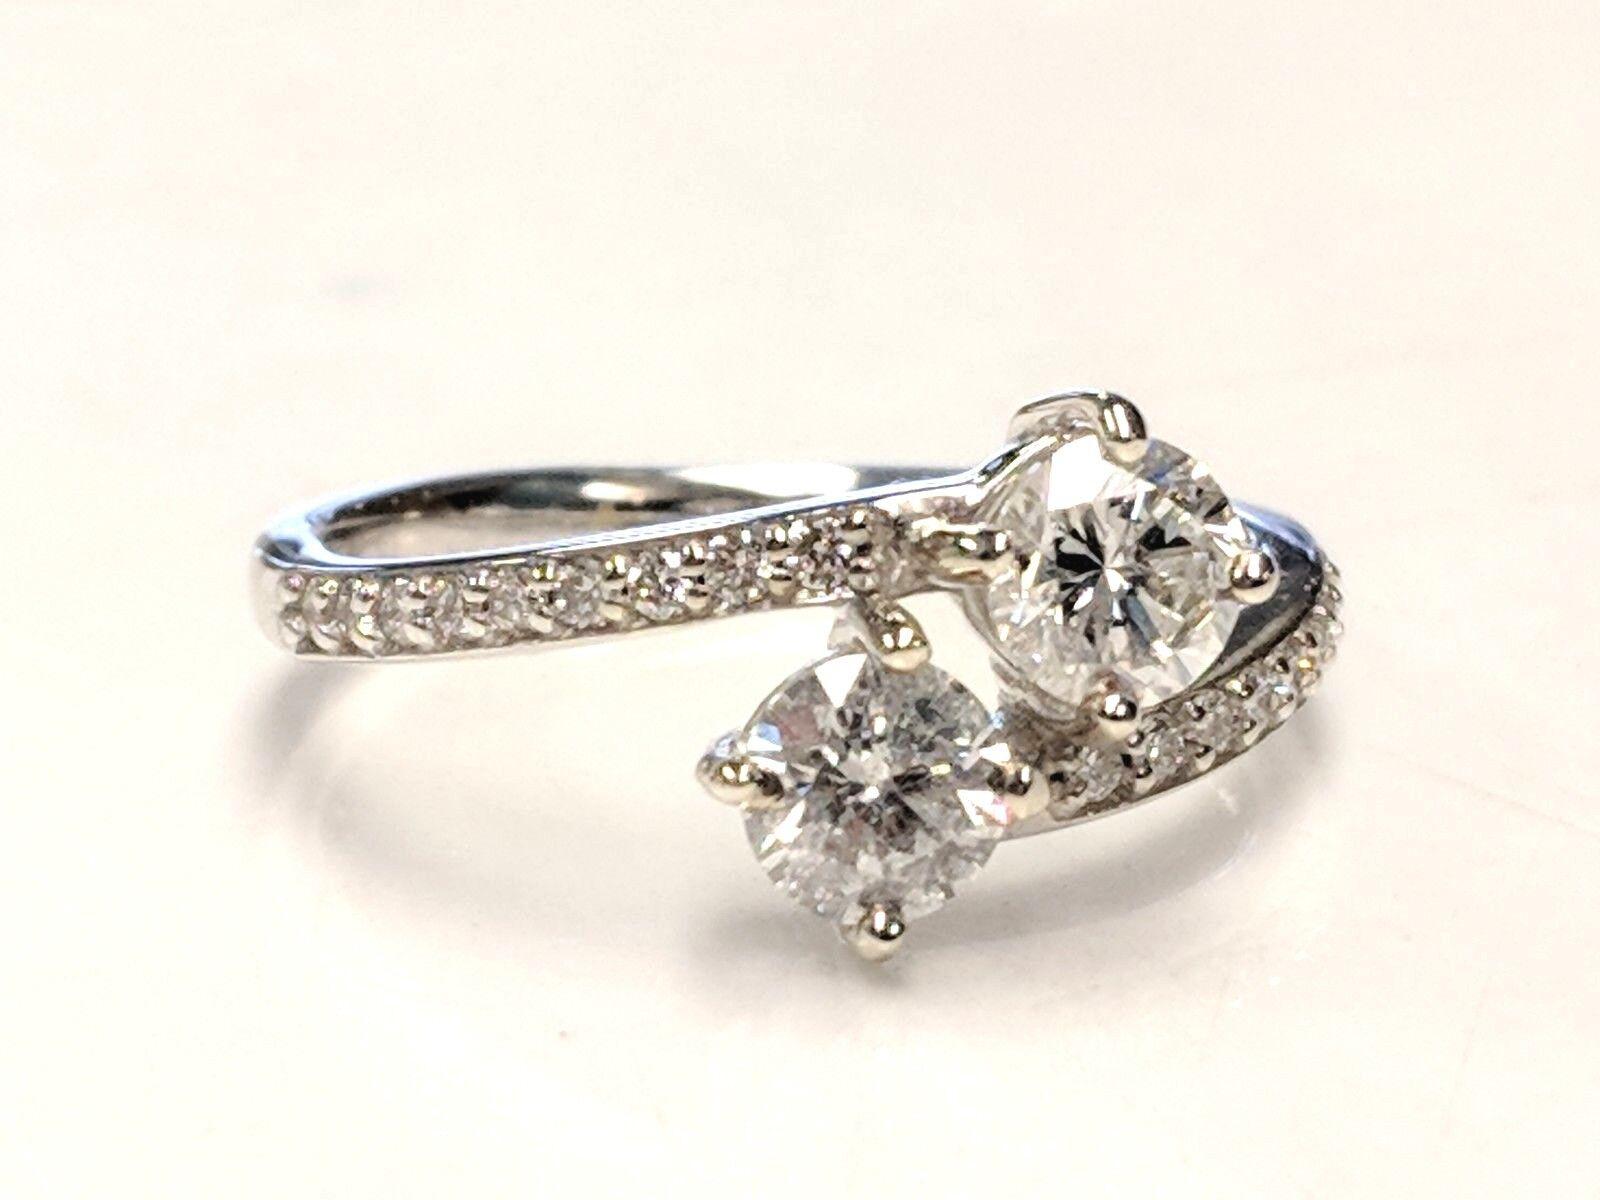 4df21f41c2589 Ring Diamond Bi-pass 1CTW NEW in gold White 14KT sbbr175424110 ...